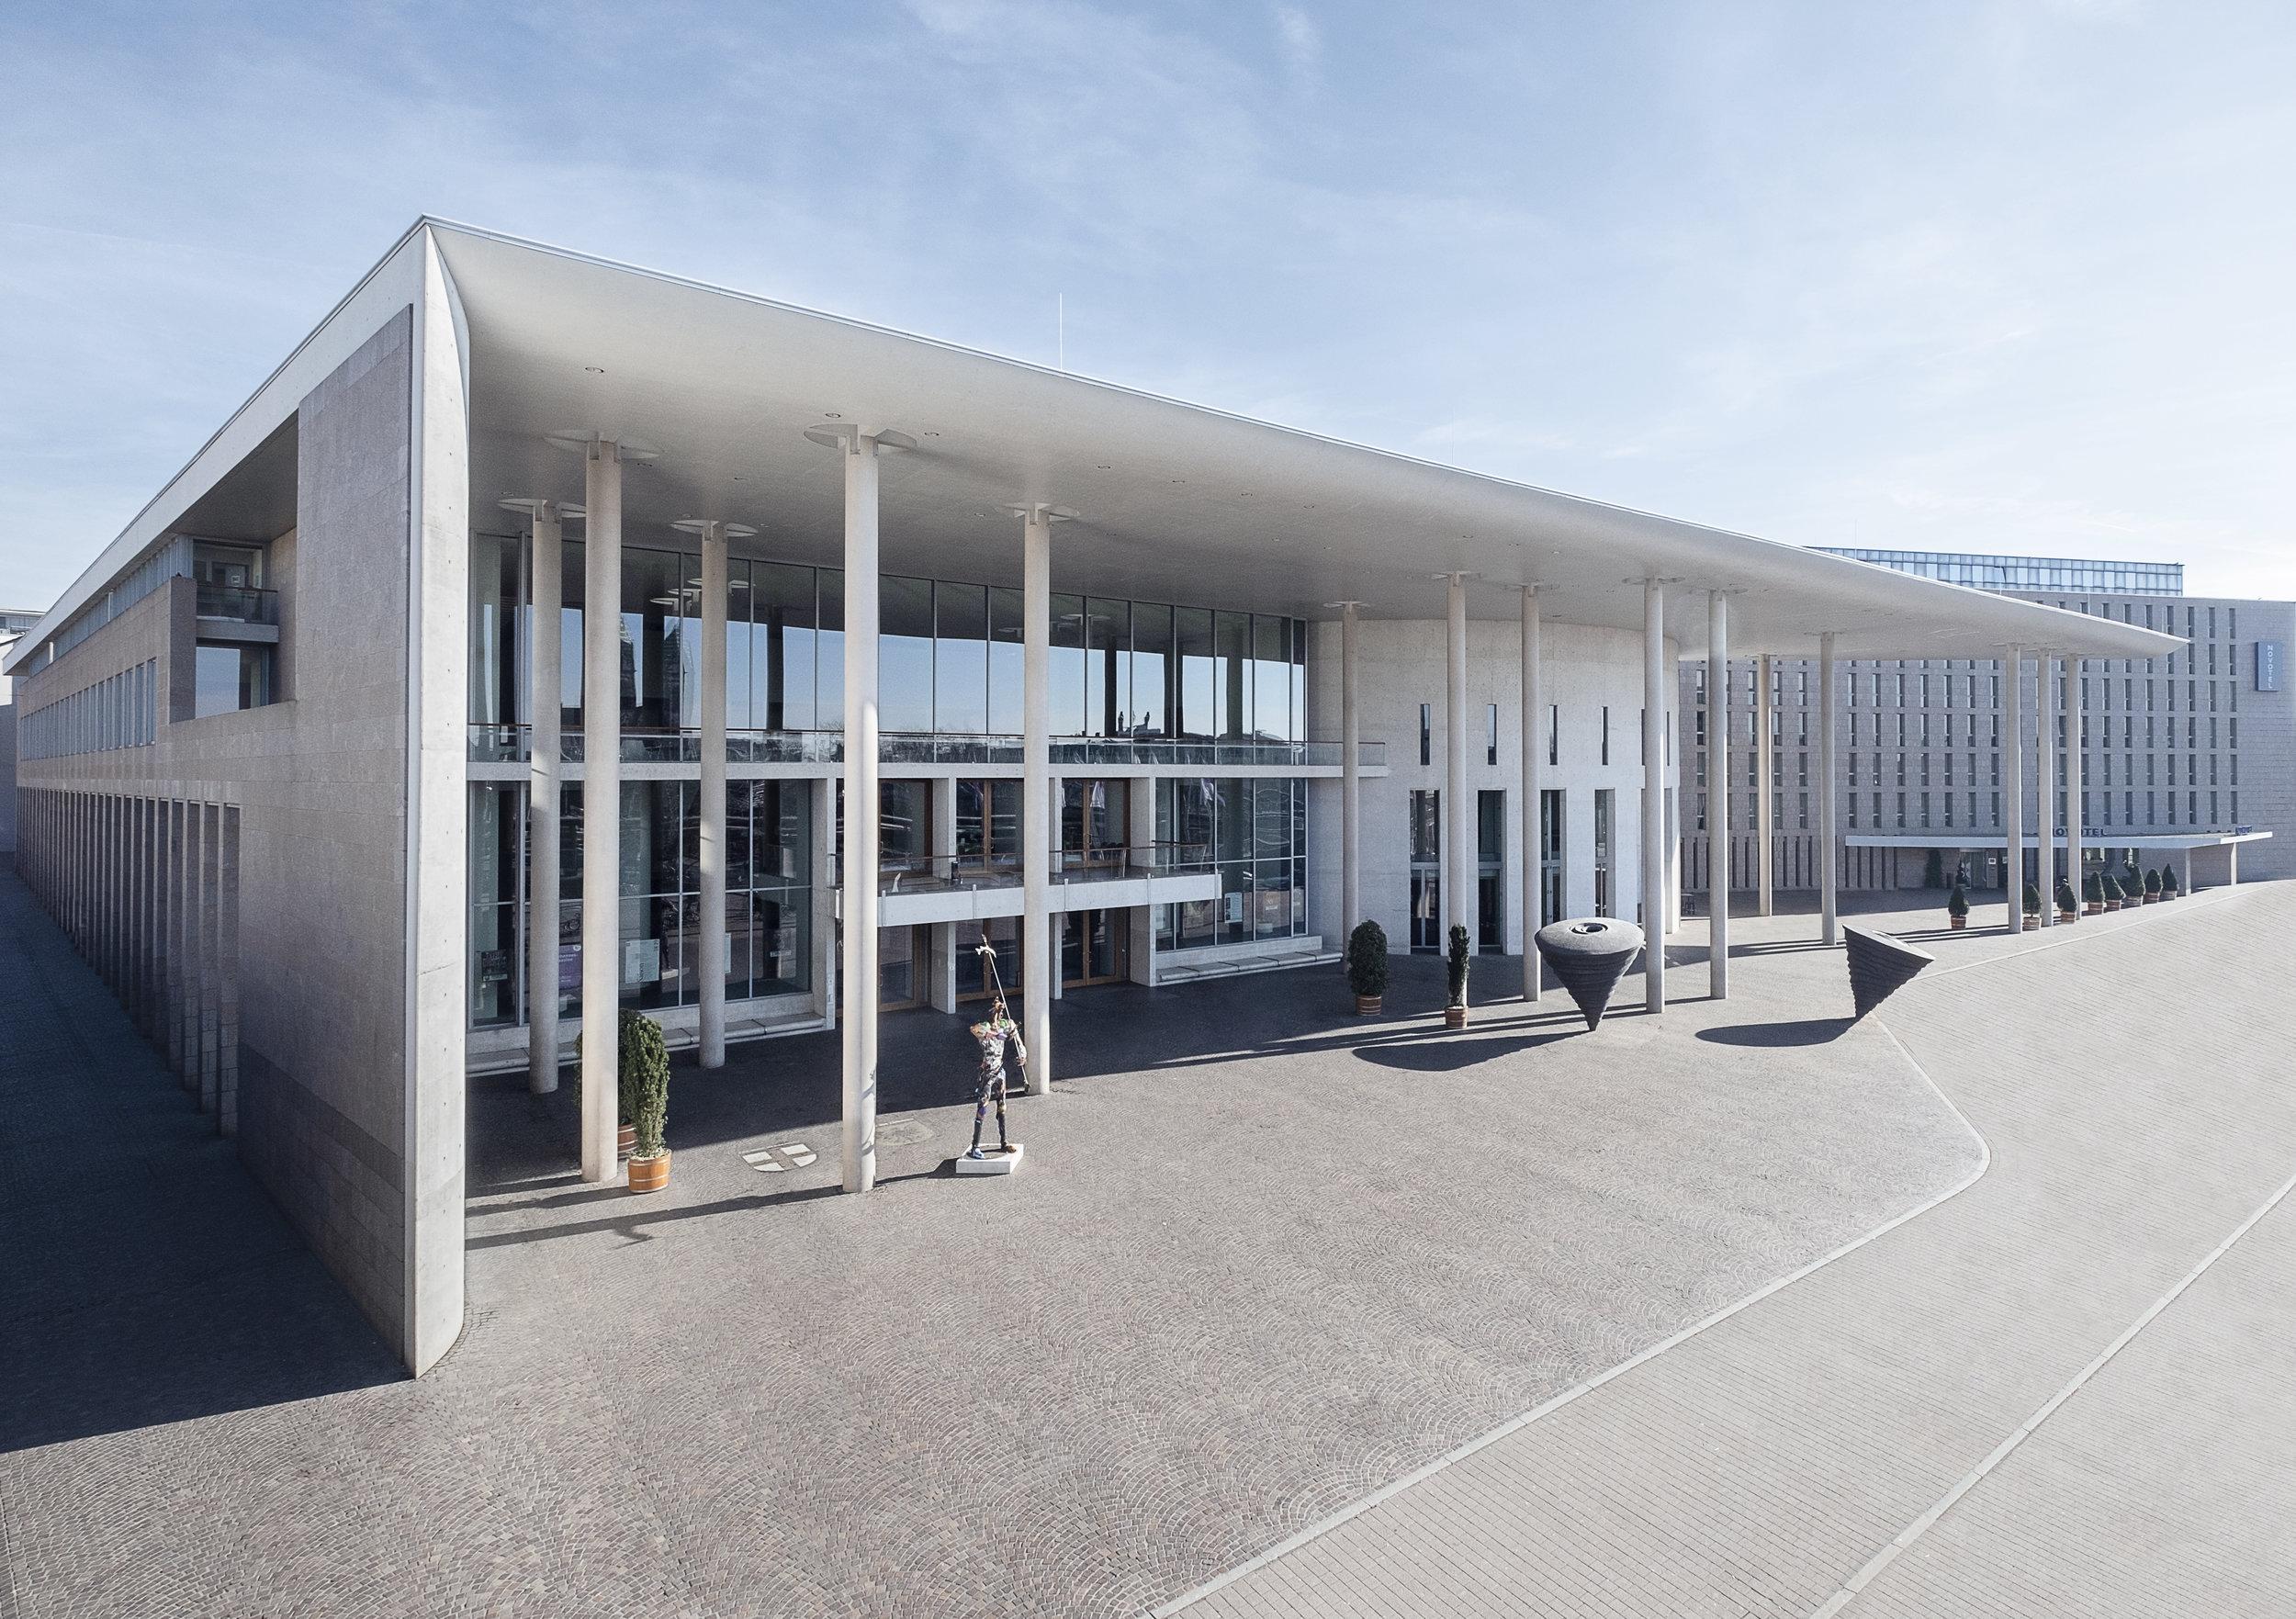 MTD_Freiburg_2019_67-Edit.jpg